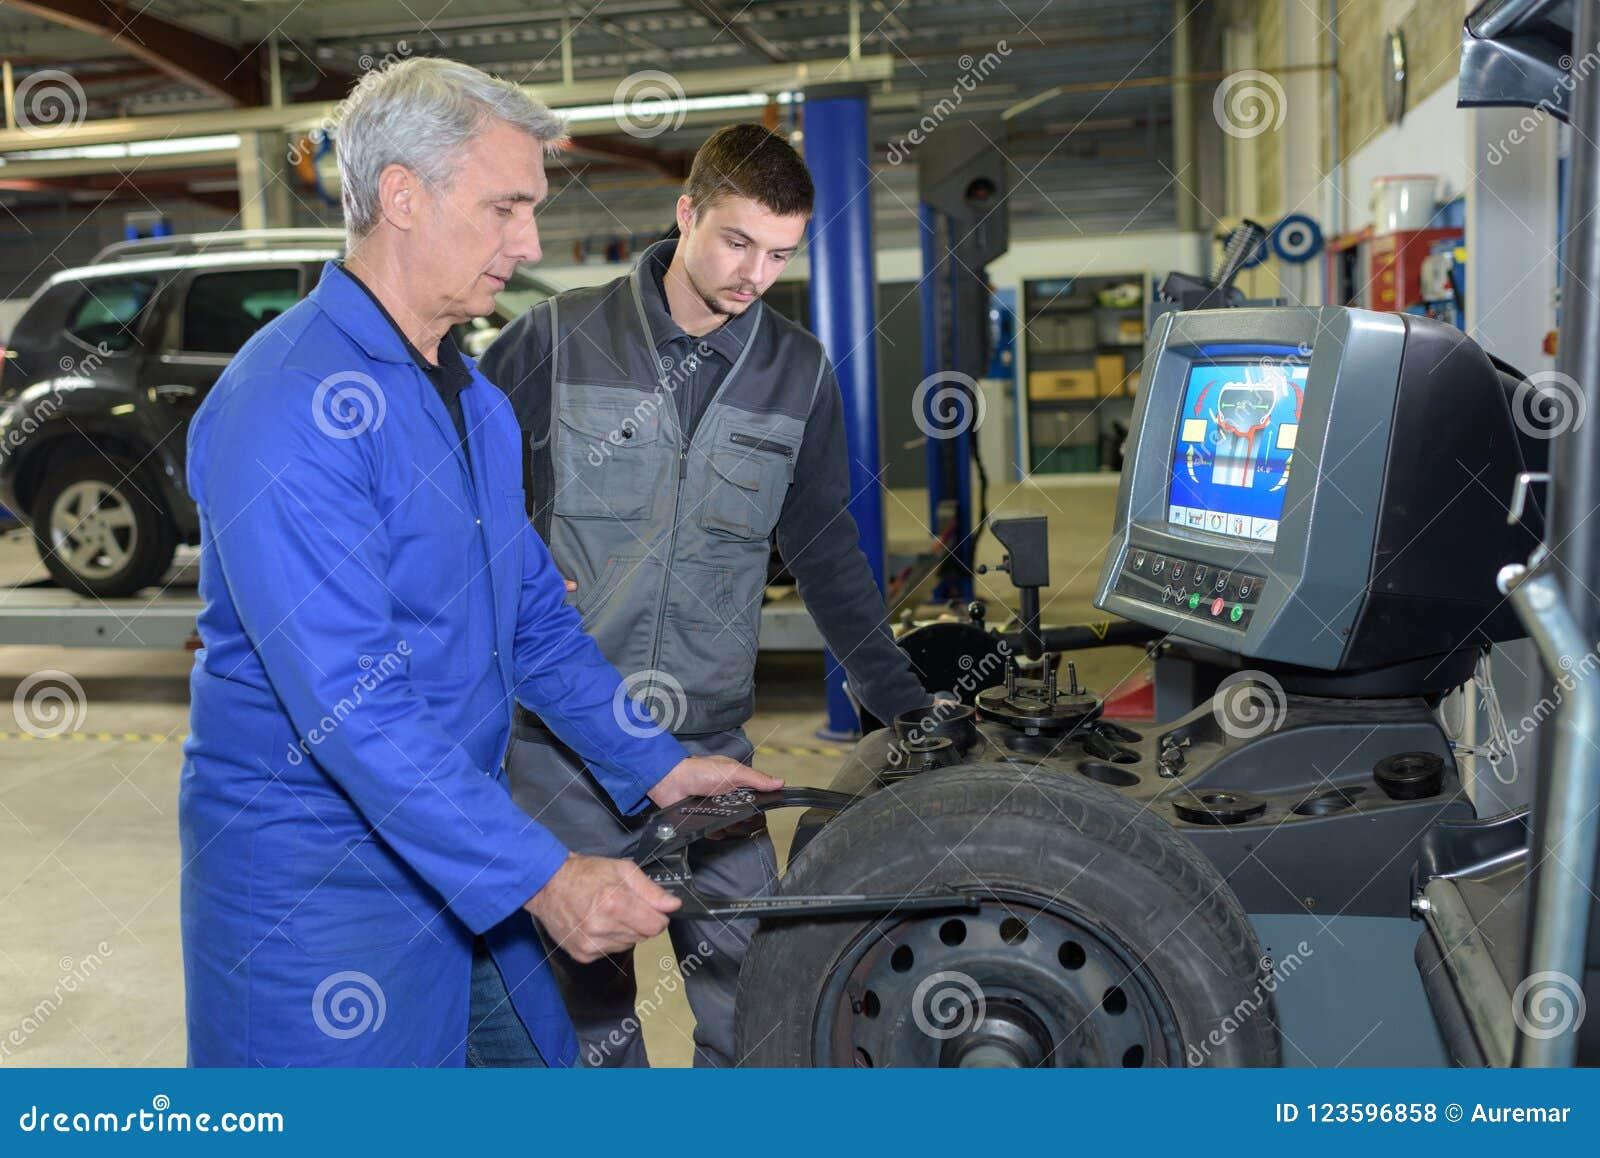 auto mechanic apprenticeship requirements